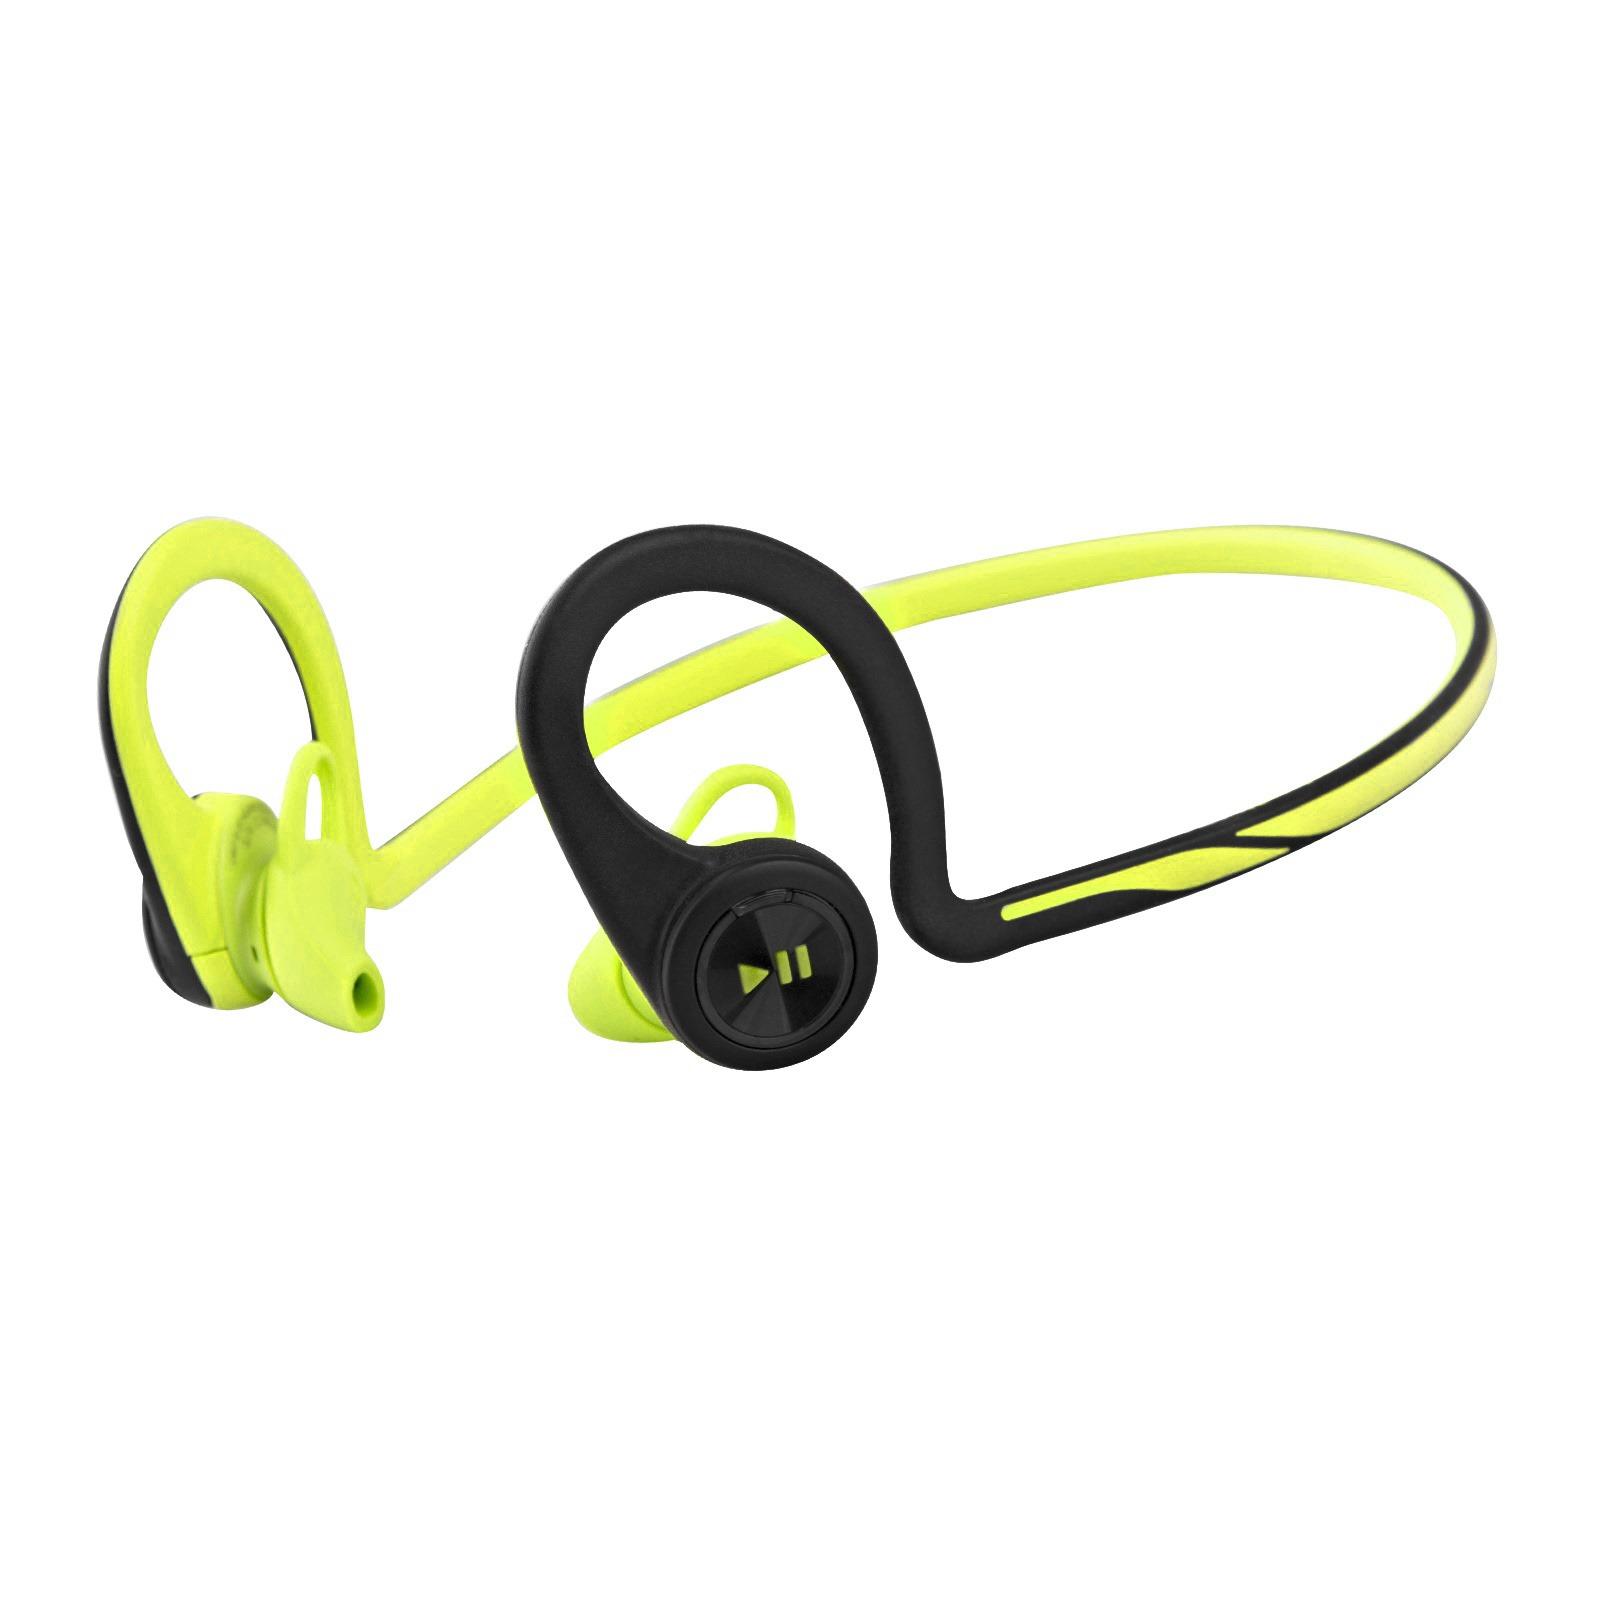 Plantronics Backbeat Fit Wireless Headphones and Microphone (Green) PLA-BACKBEATFIT-GN-B1